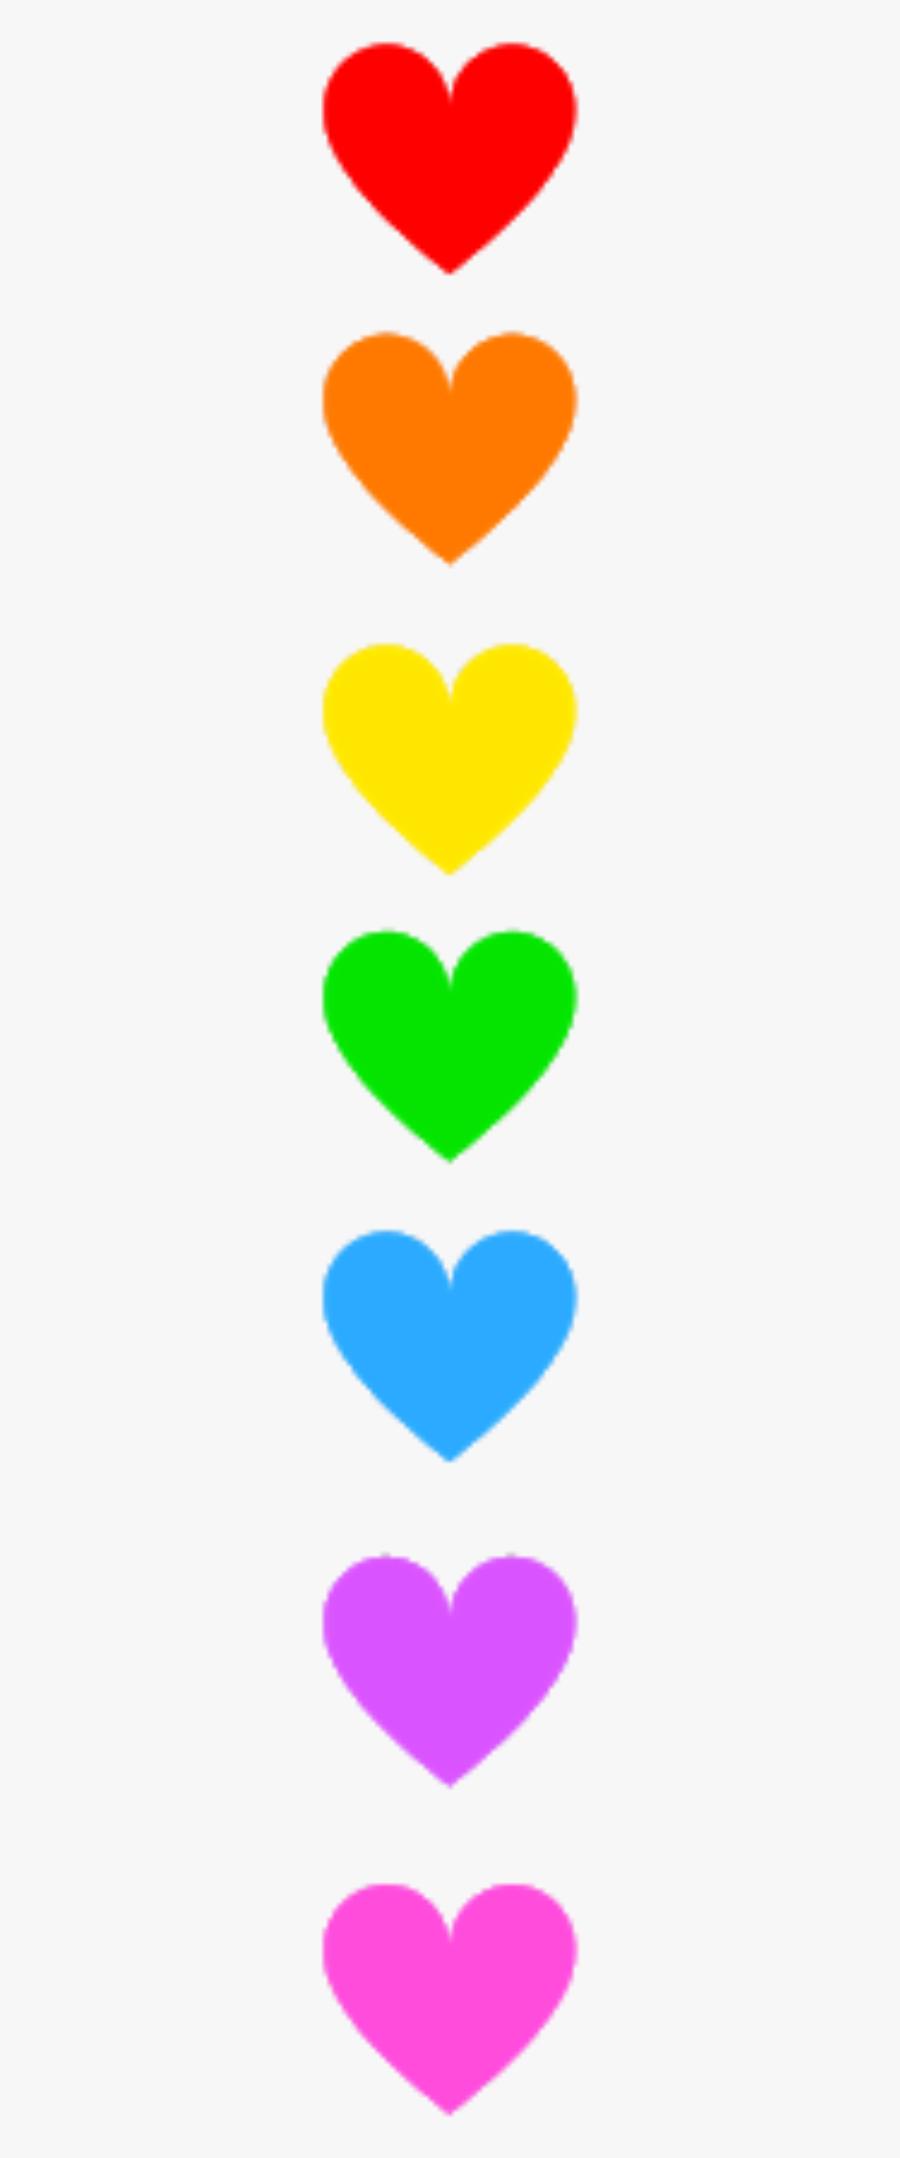 #hearts #colourful #rainbow #divider #header #textline - Heart, Transparent Clipart